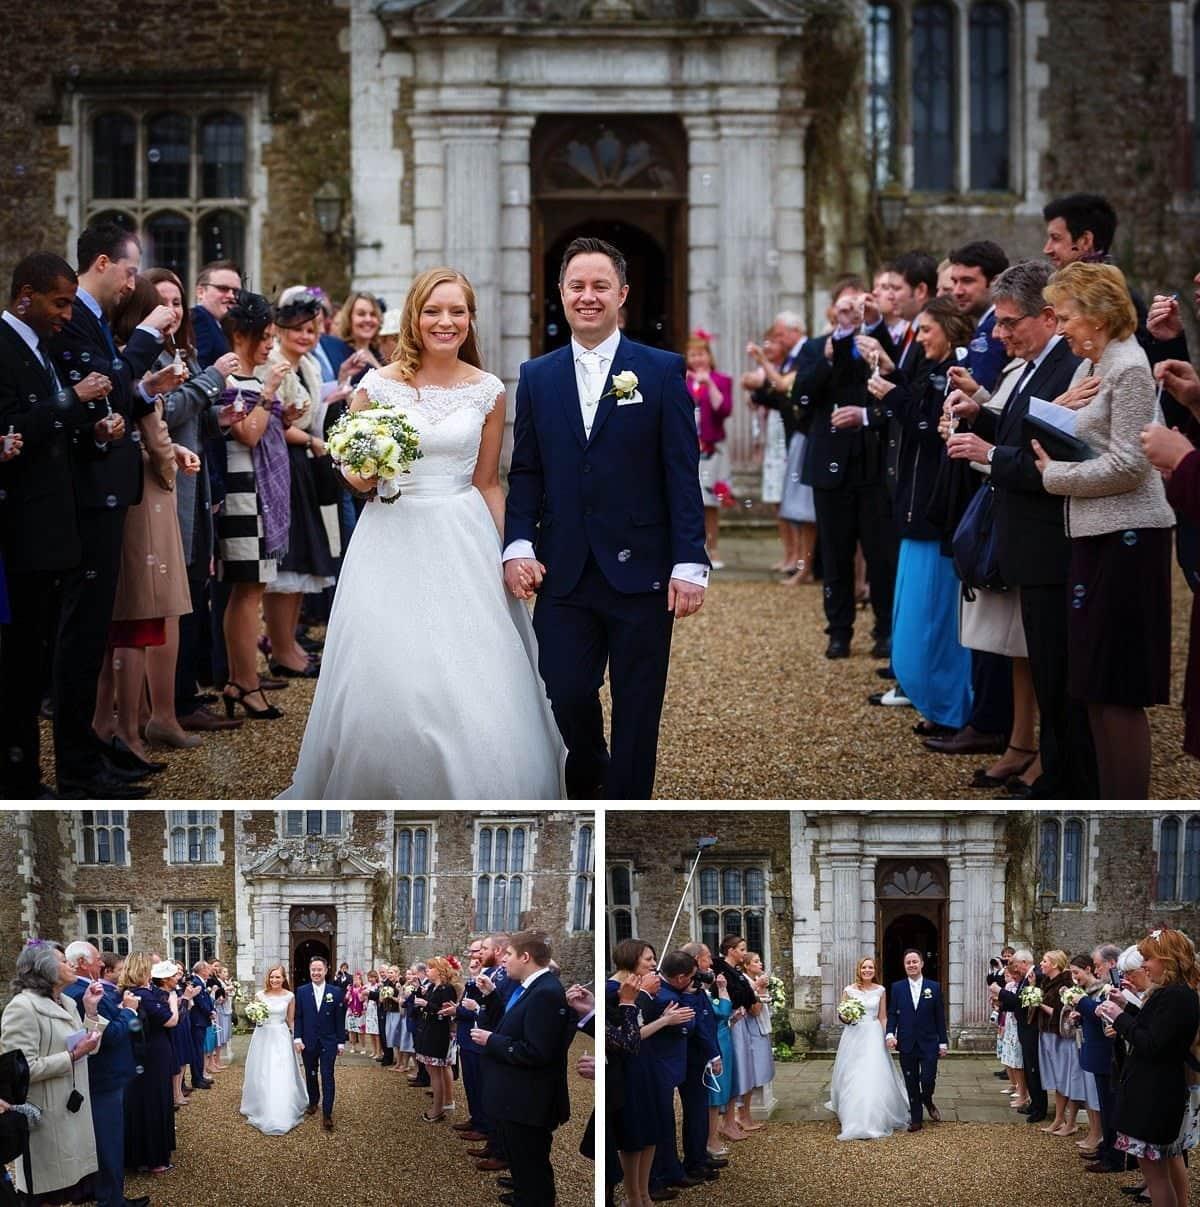 loseley-wedding-photos-055.jpg